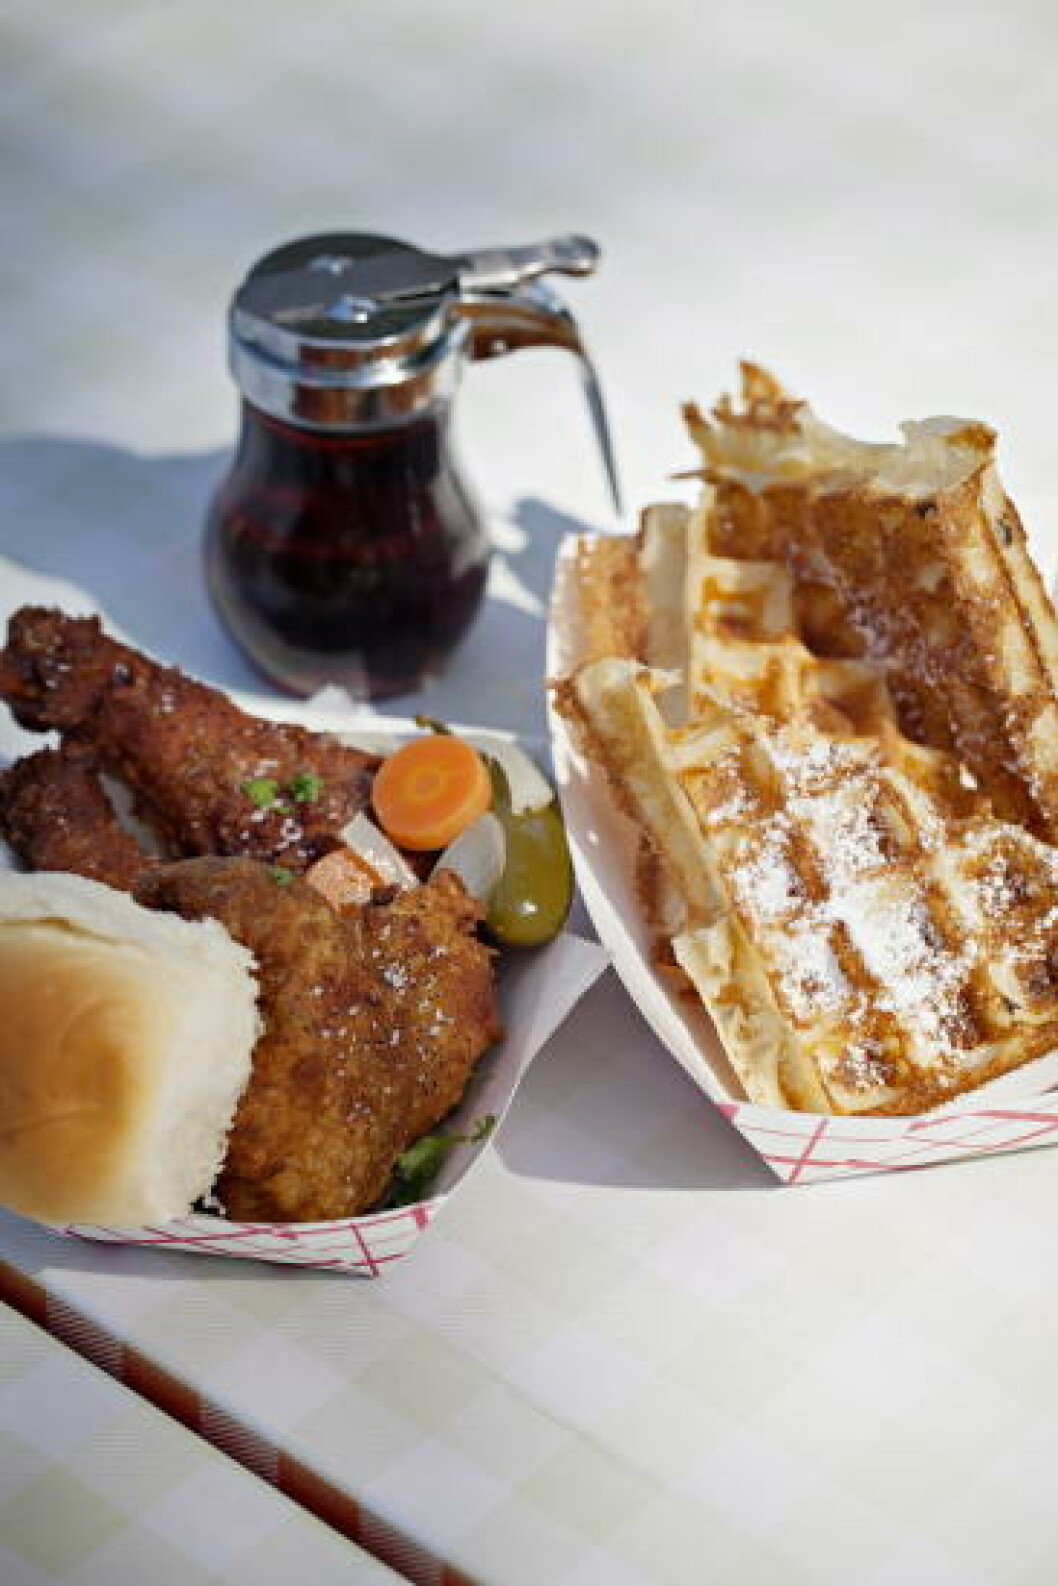 FRITERTE FRISTELSER: Frityrstekt kylling og frityrstekt vaffel fra Ms Ps Electrick Cock. Foto: JO STRAUBE